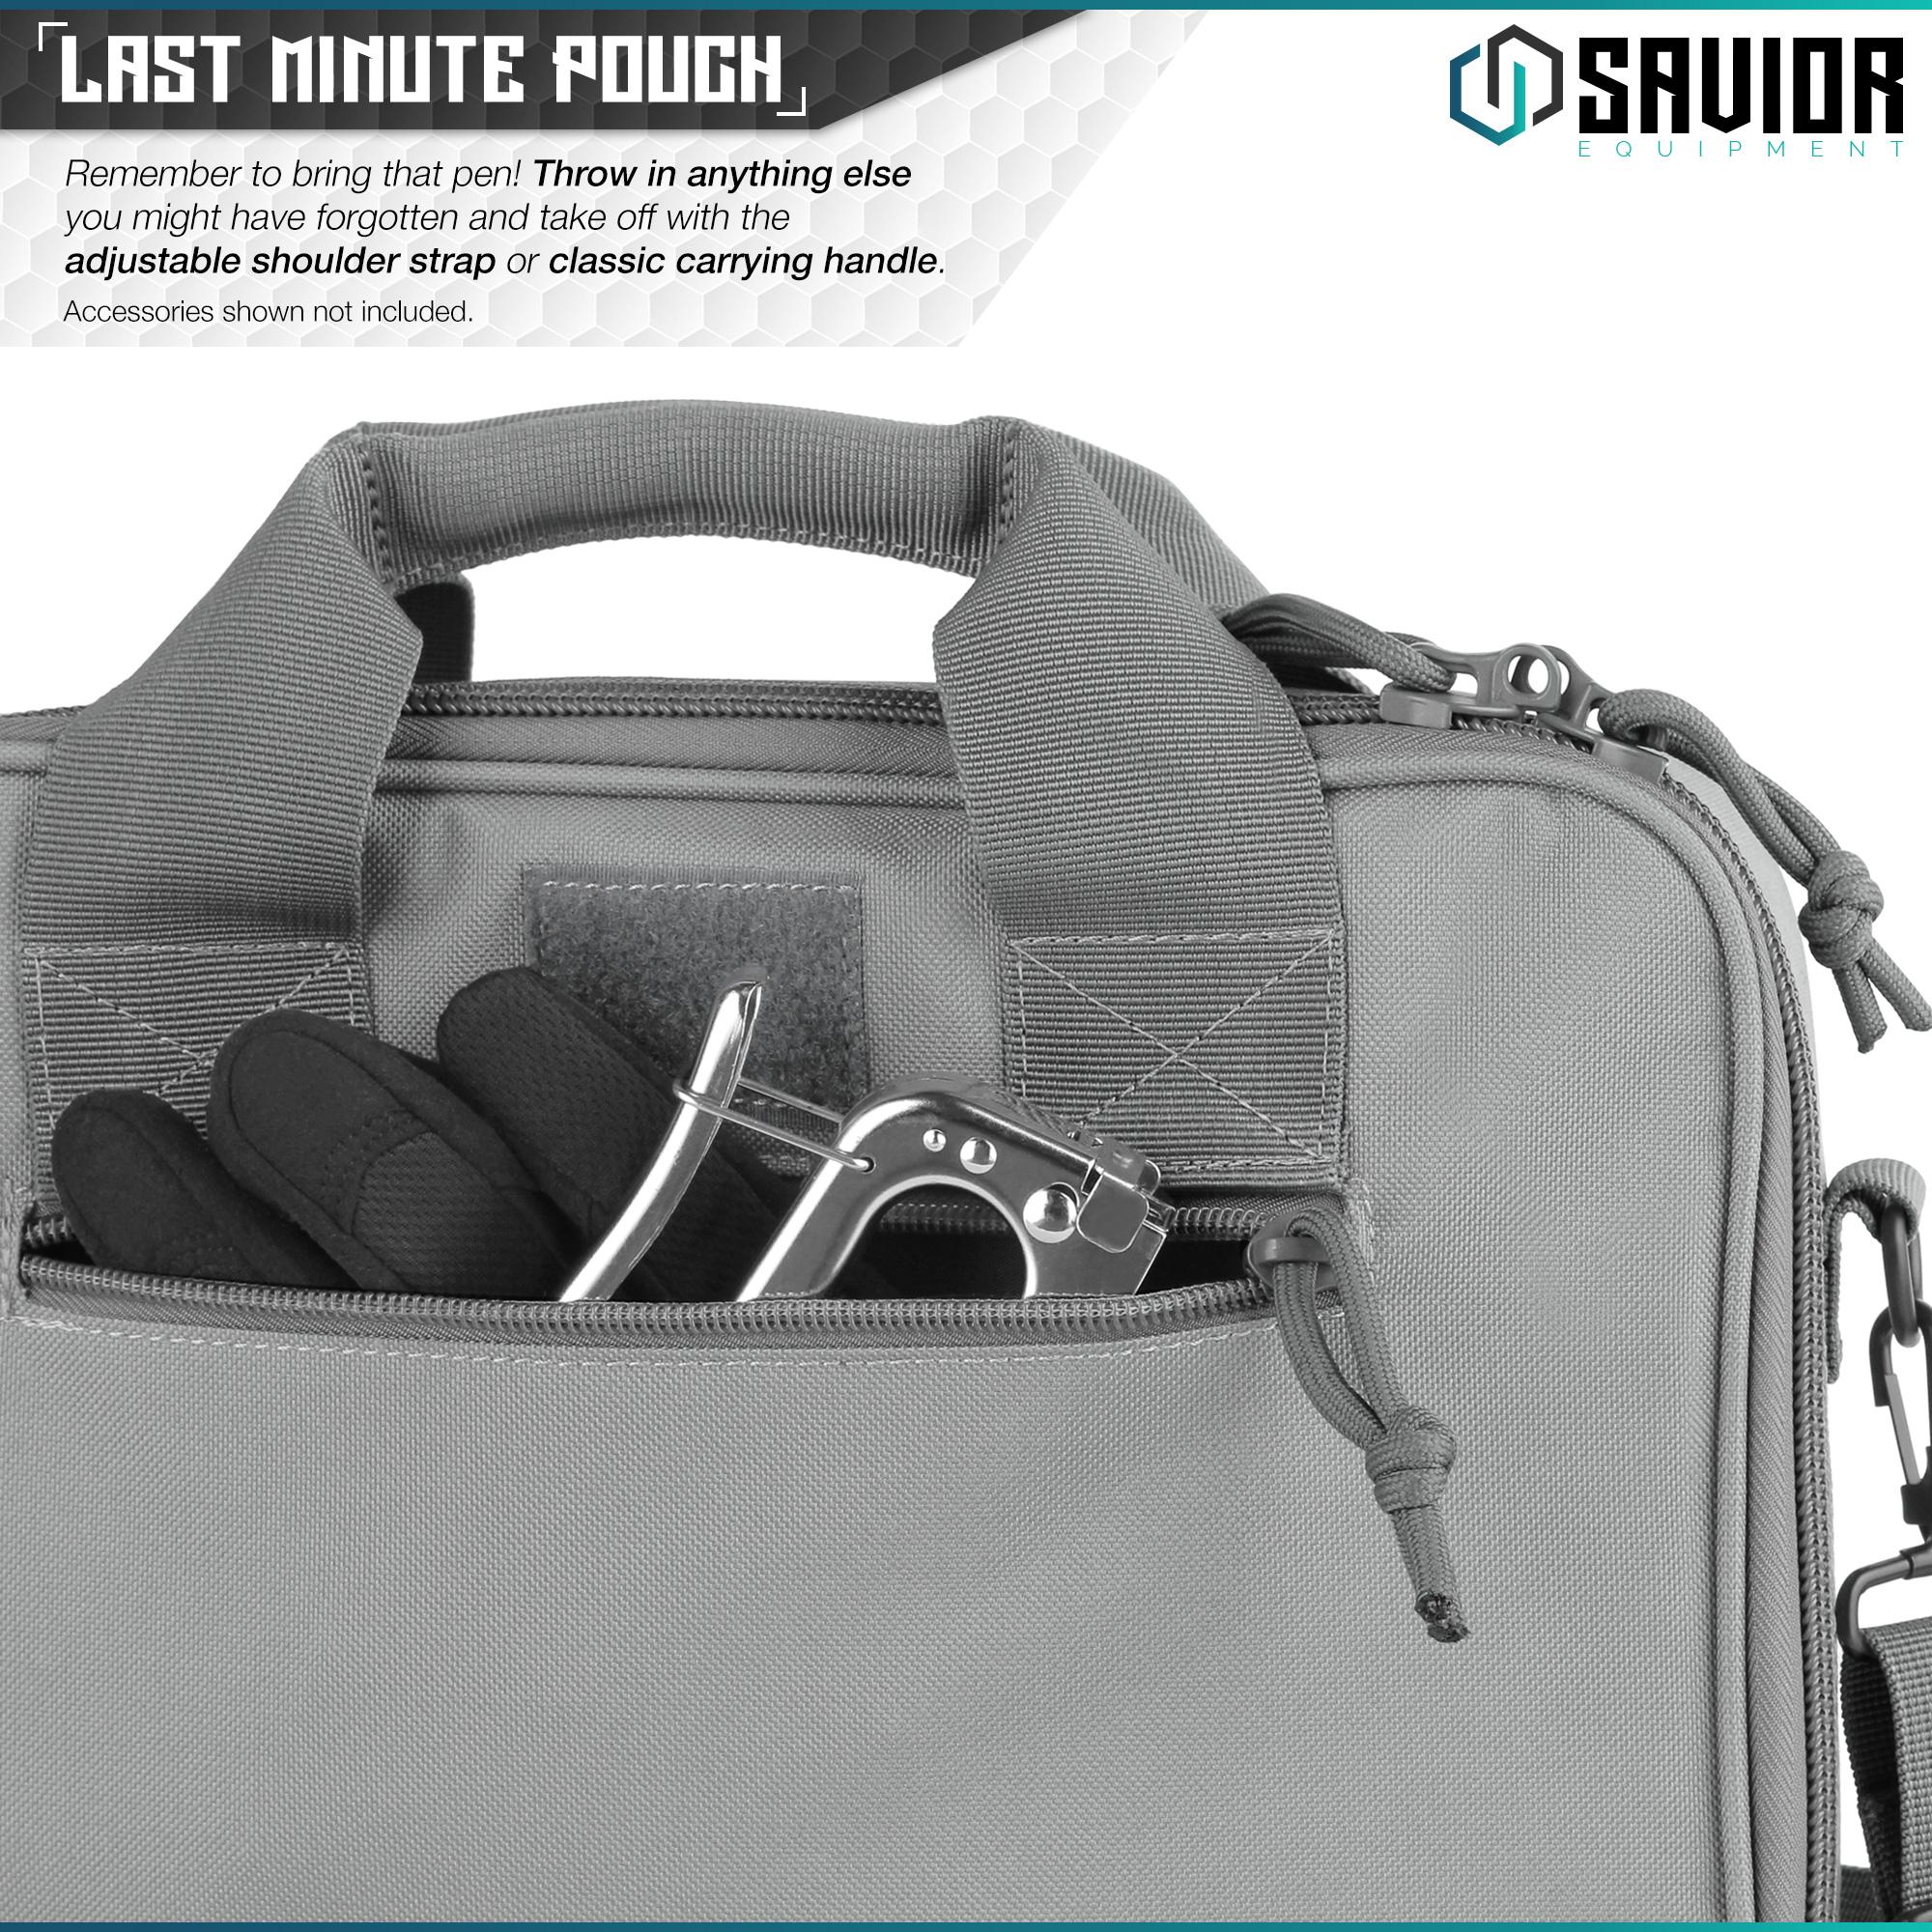 034-SAVIOR-034-Padded-Discreet-Double-Handgun-Bag-Pistol-Storage-Case-w-Mag-Pouch-Slot thumbnail 6